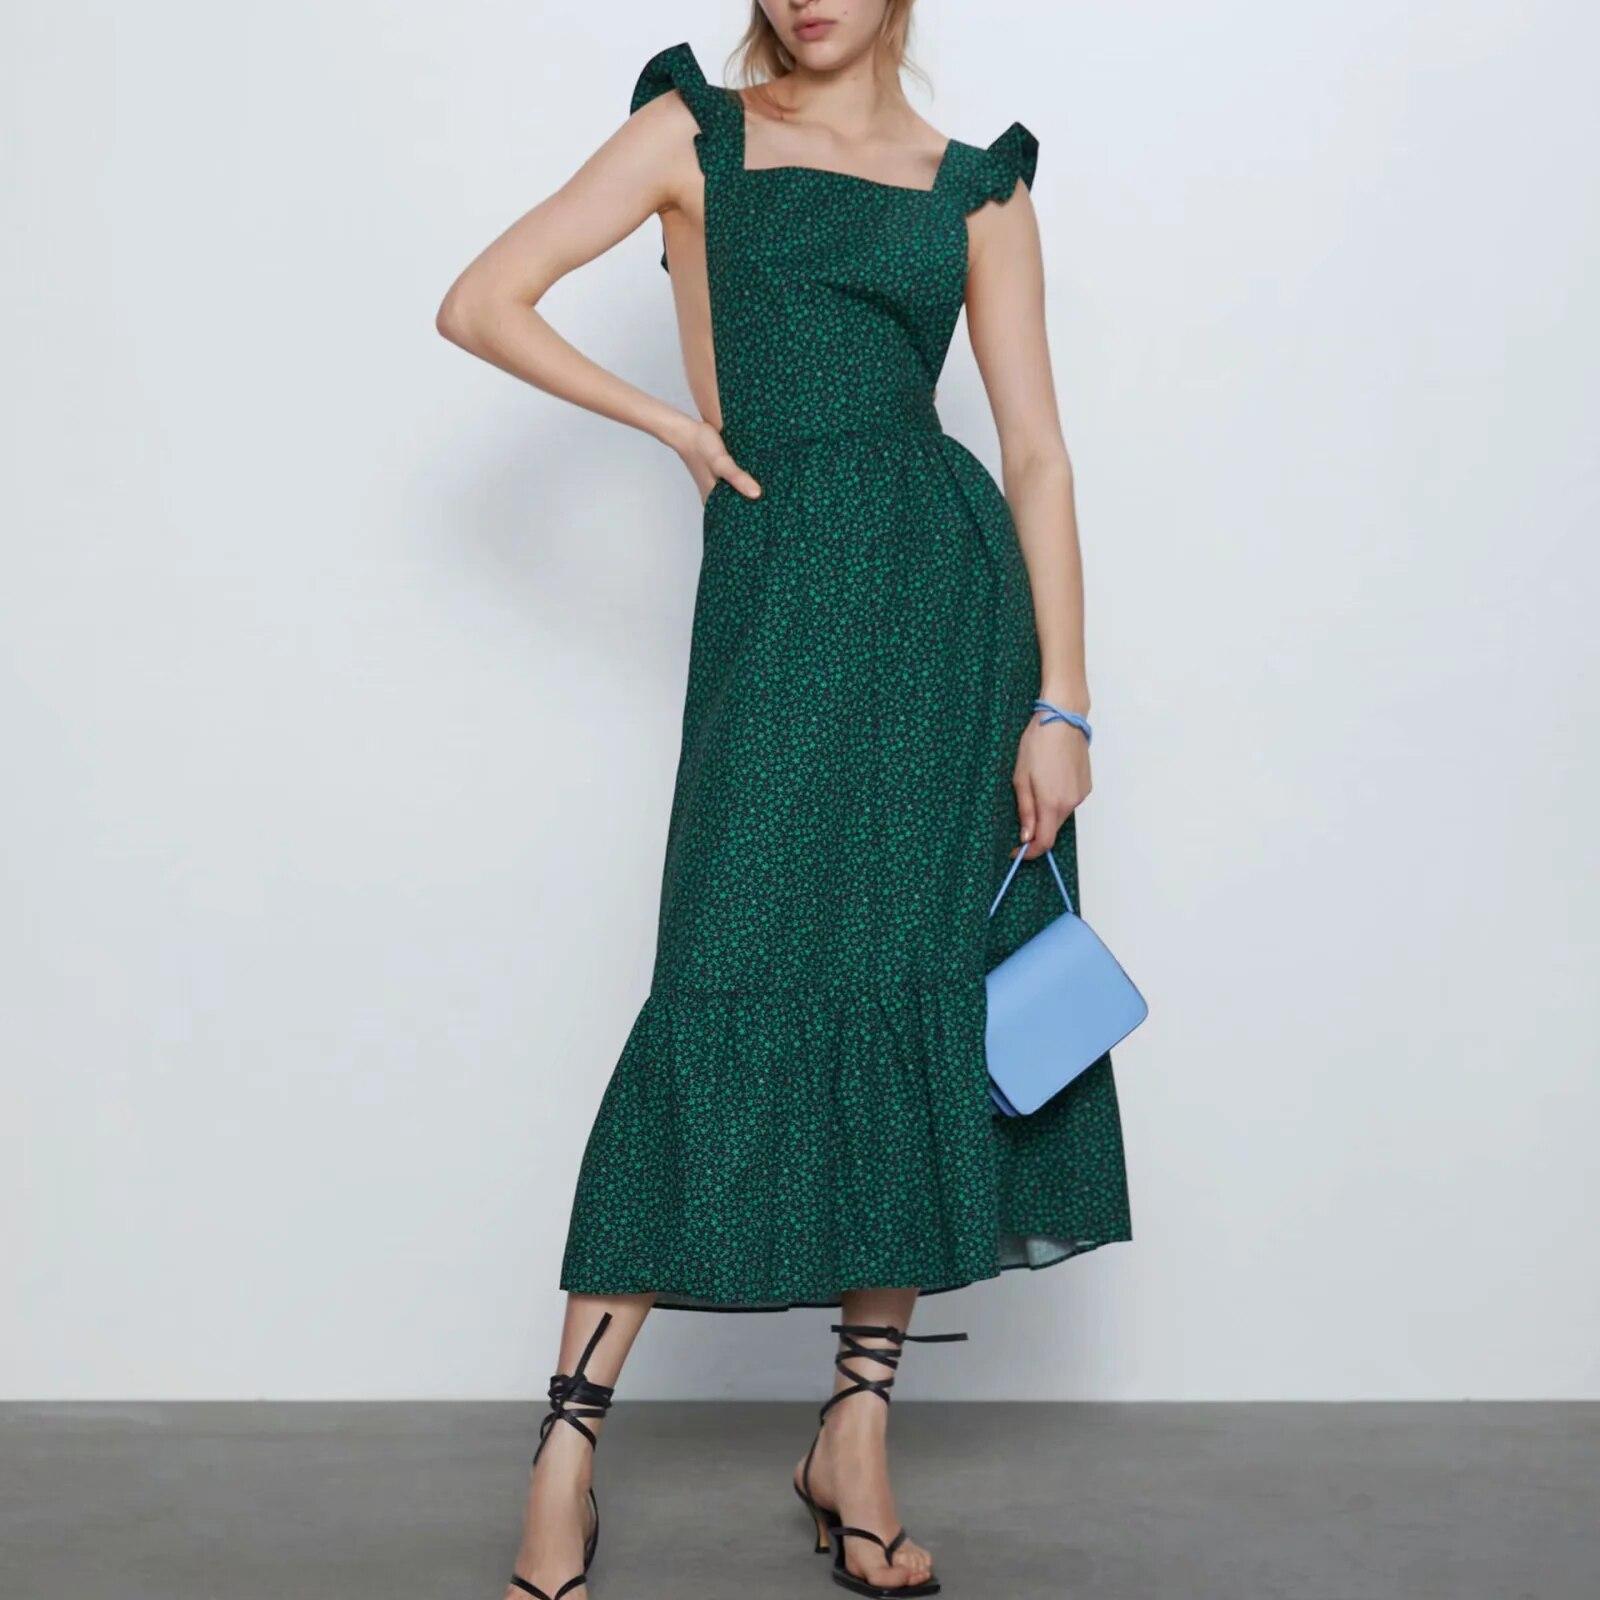 ZA women dress green floral print ruffled sexy hollow out vest chic ladies elegant female maxi dress